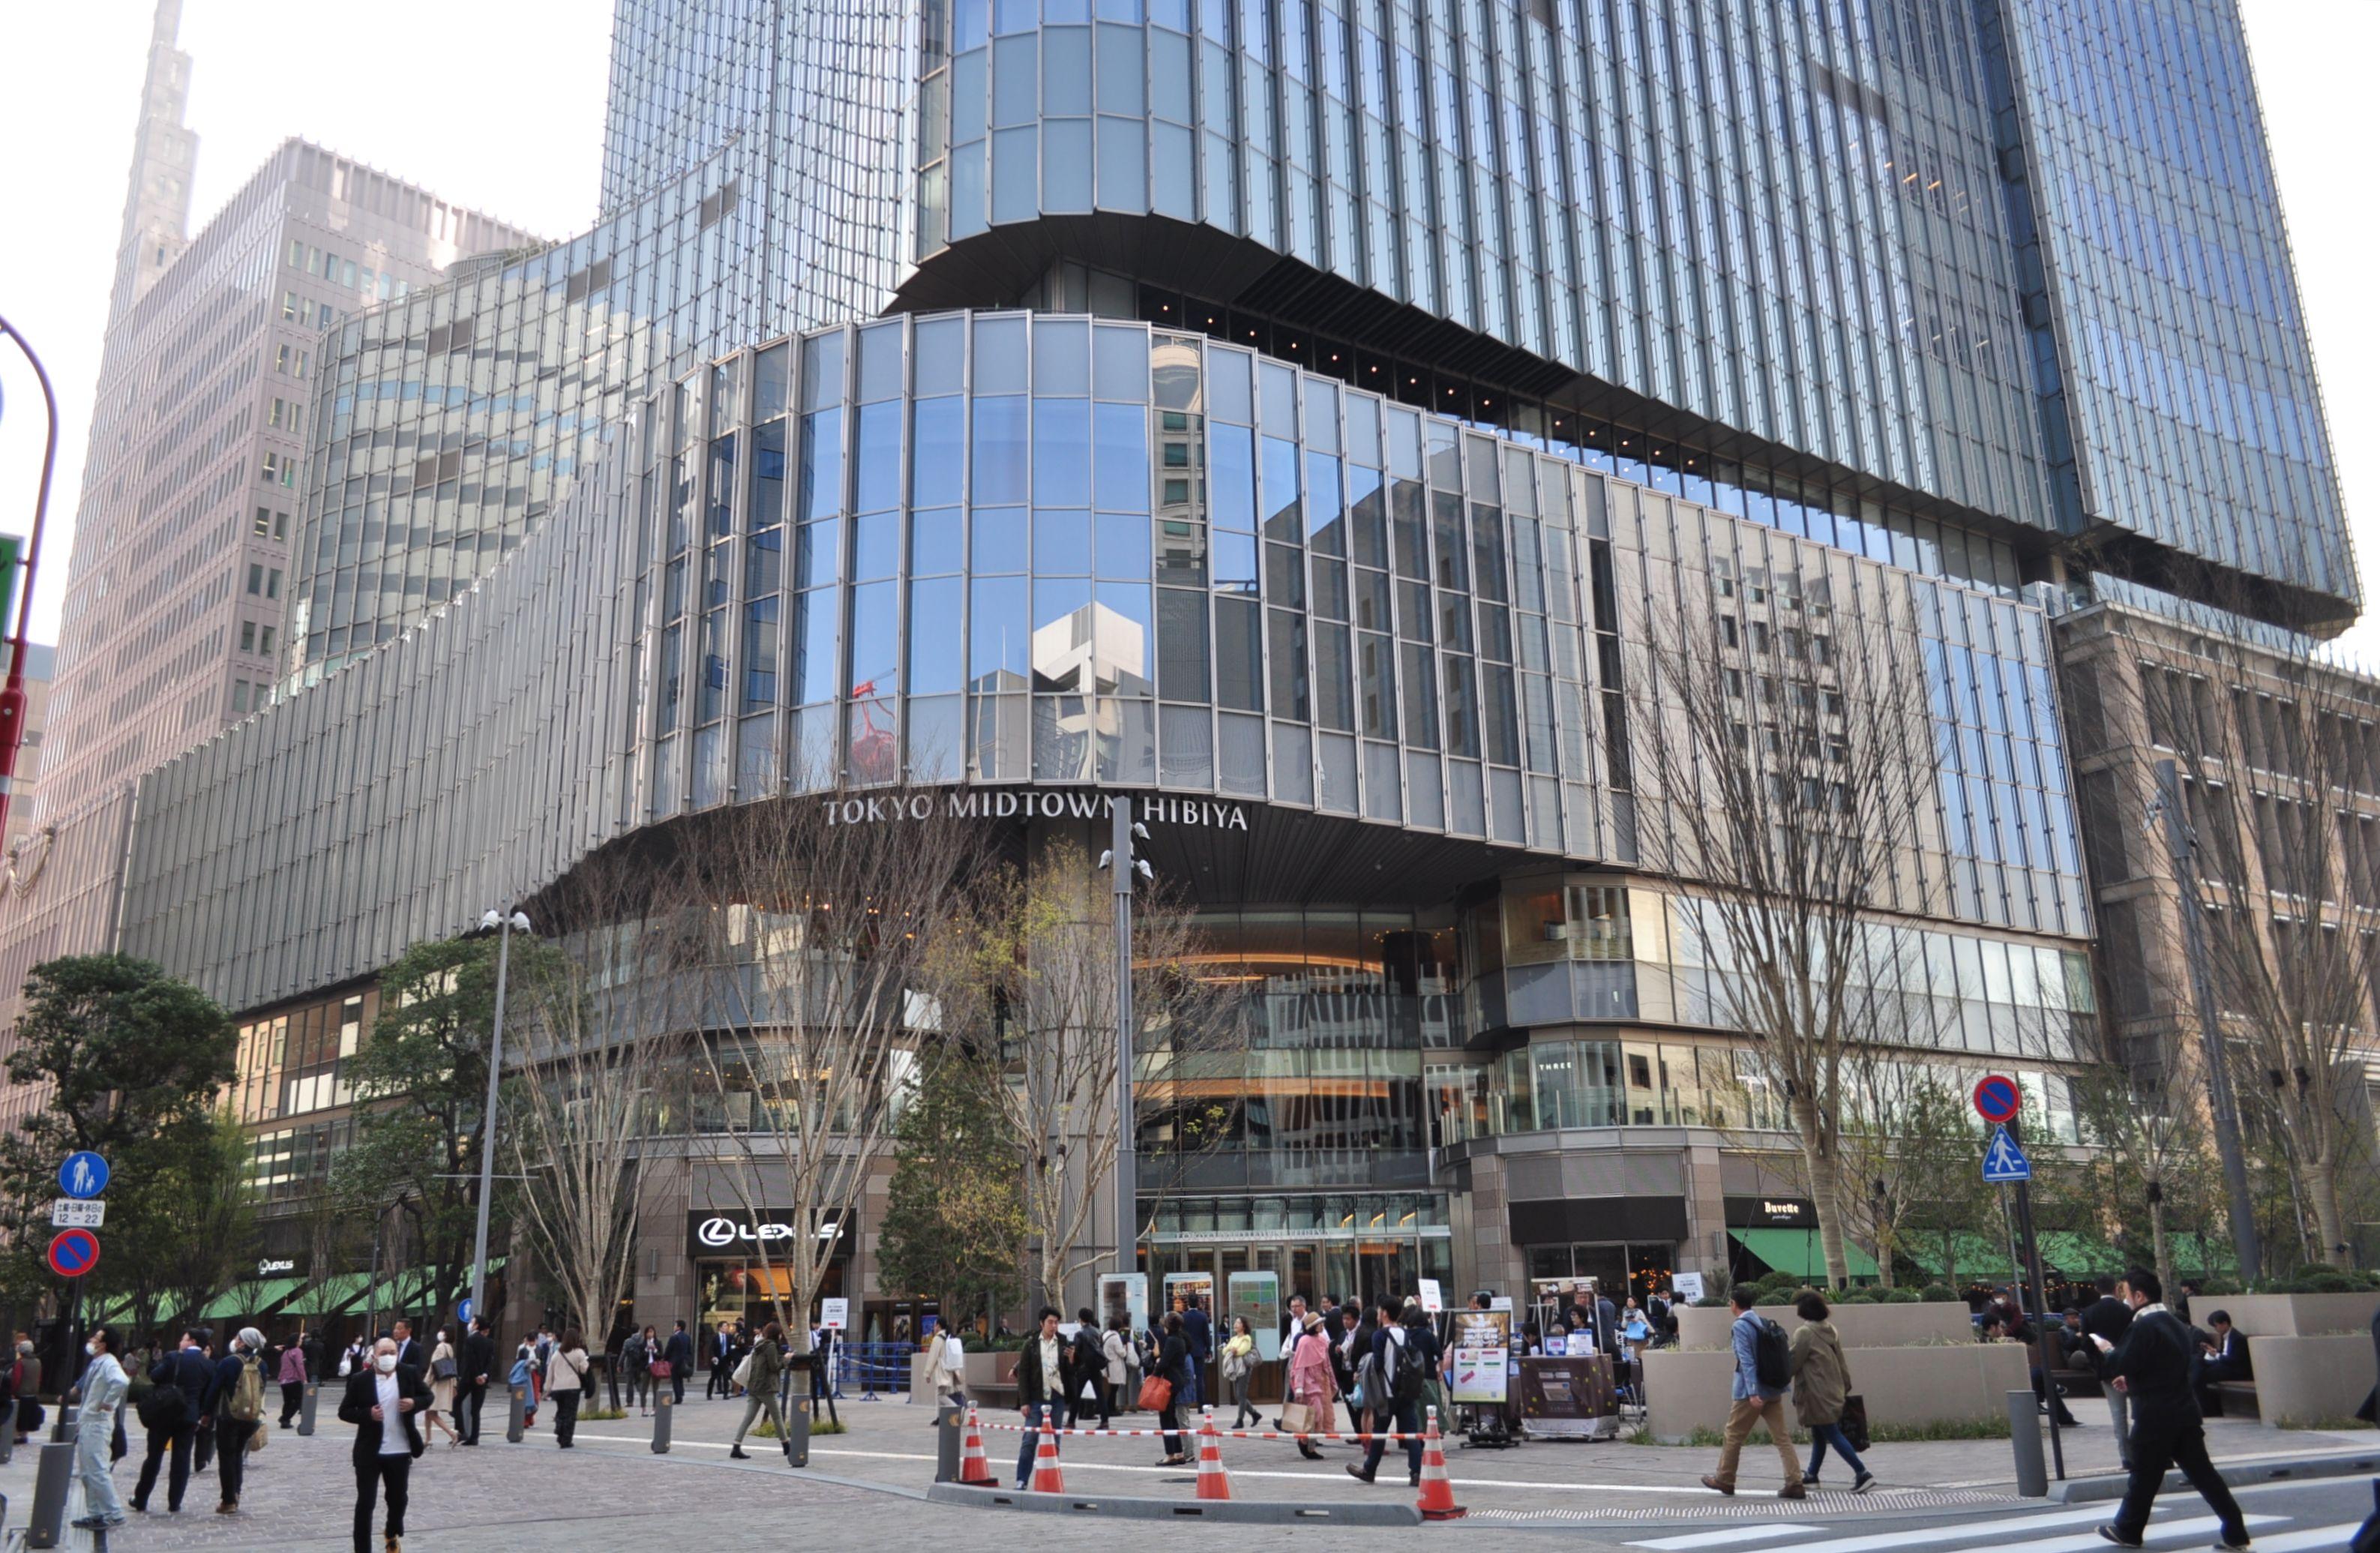 File:Tokyo Midtown Hibiya-3.jpg - Wikimedia Commons